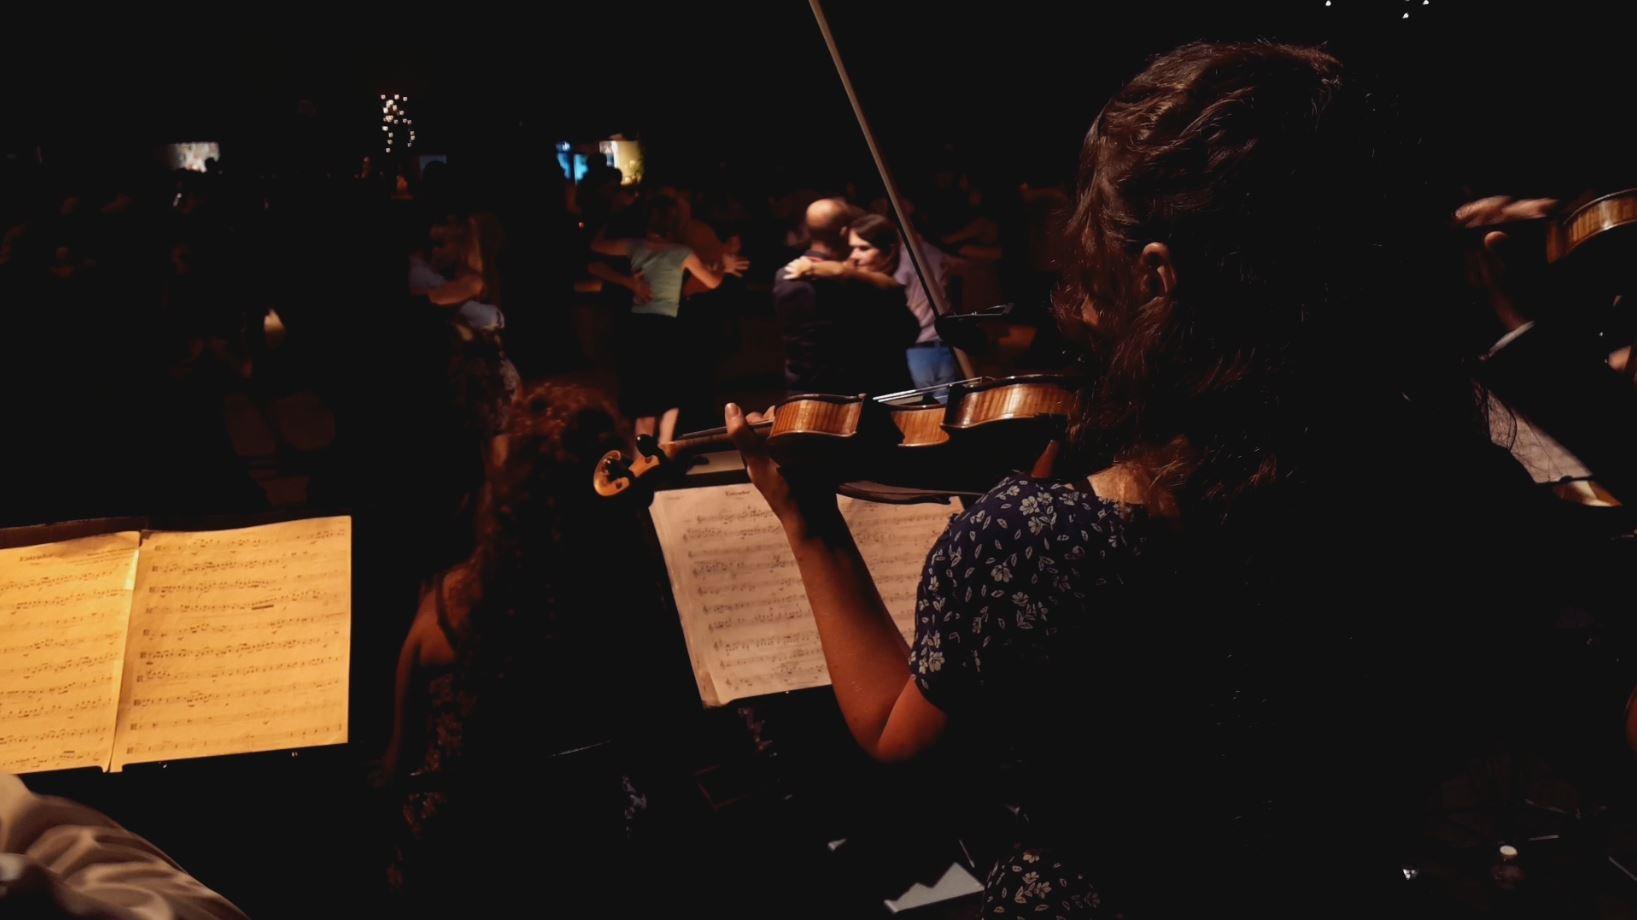 Sivis'art Videomaker presents Festival Tango Roots 2017